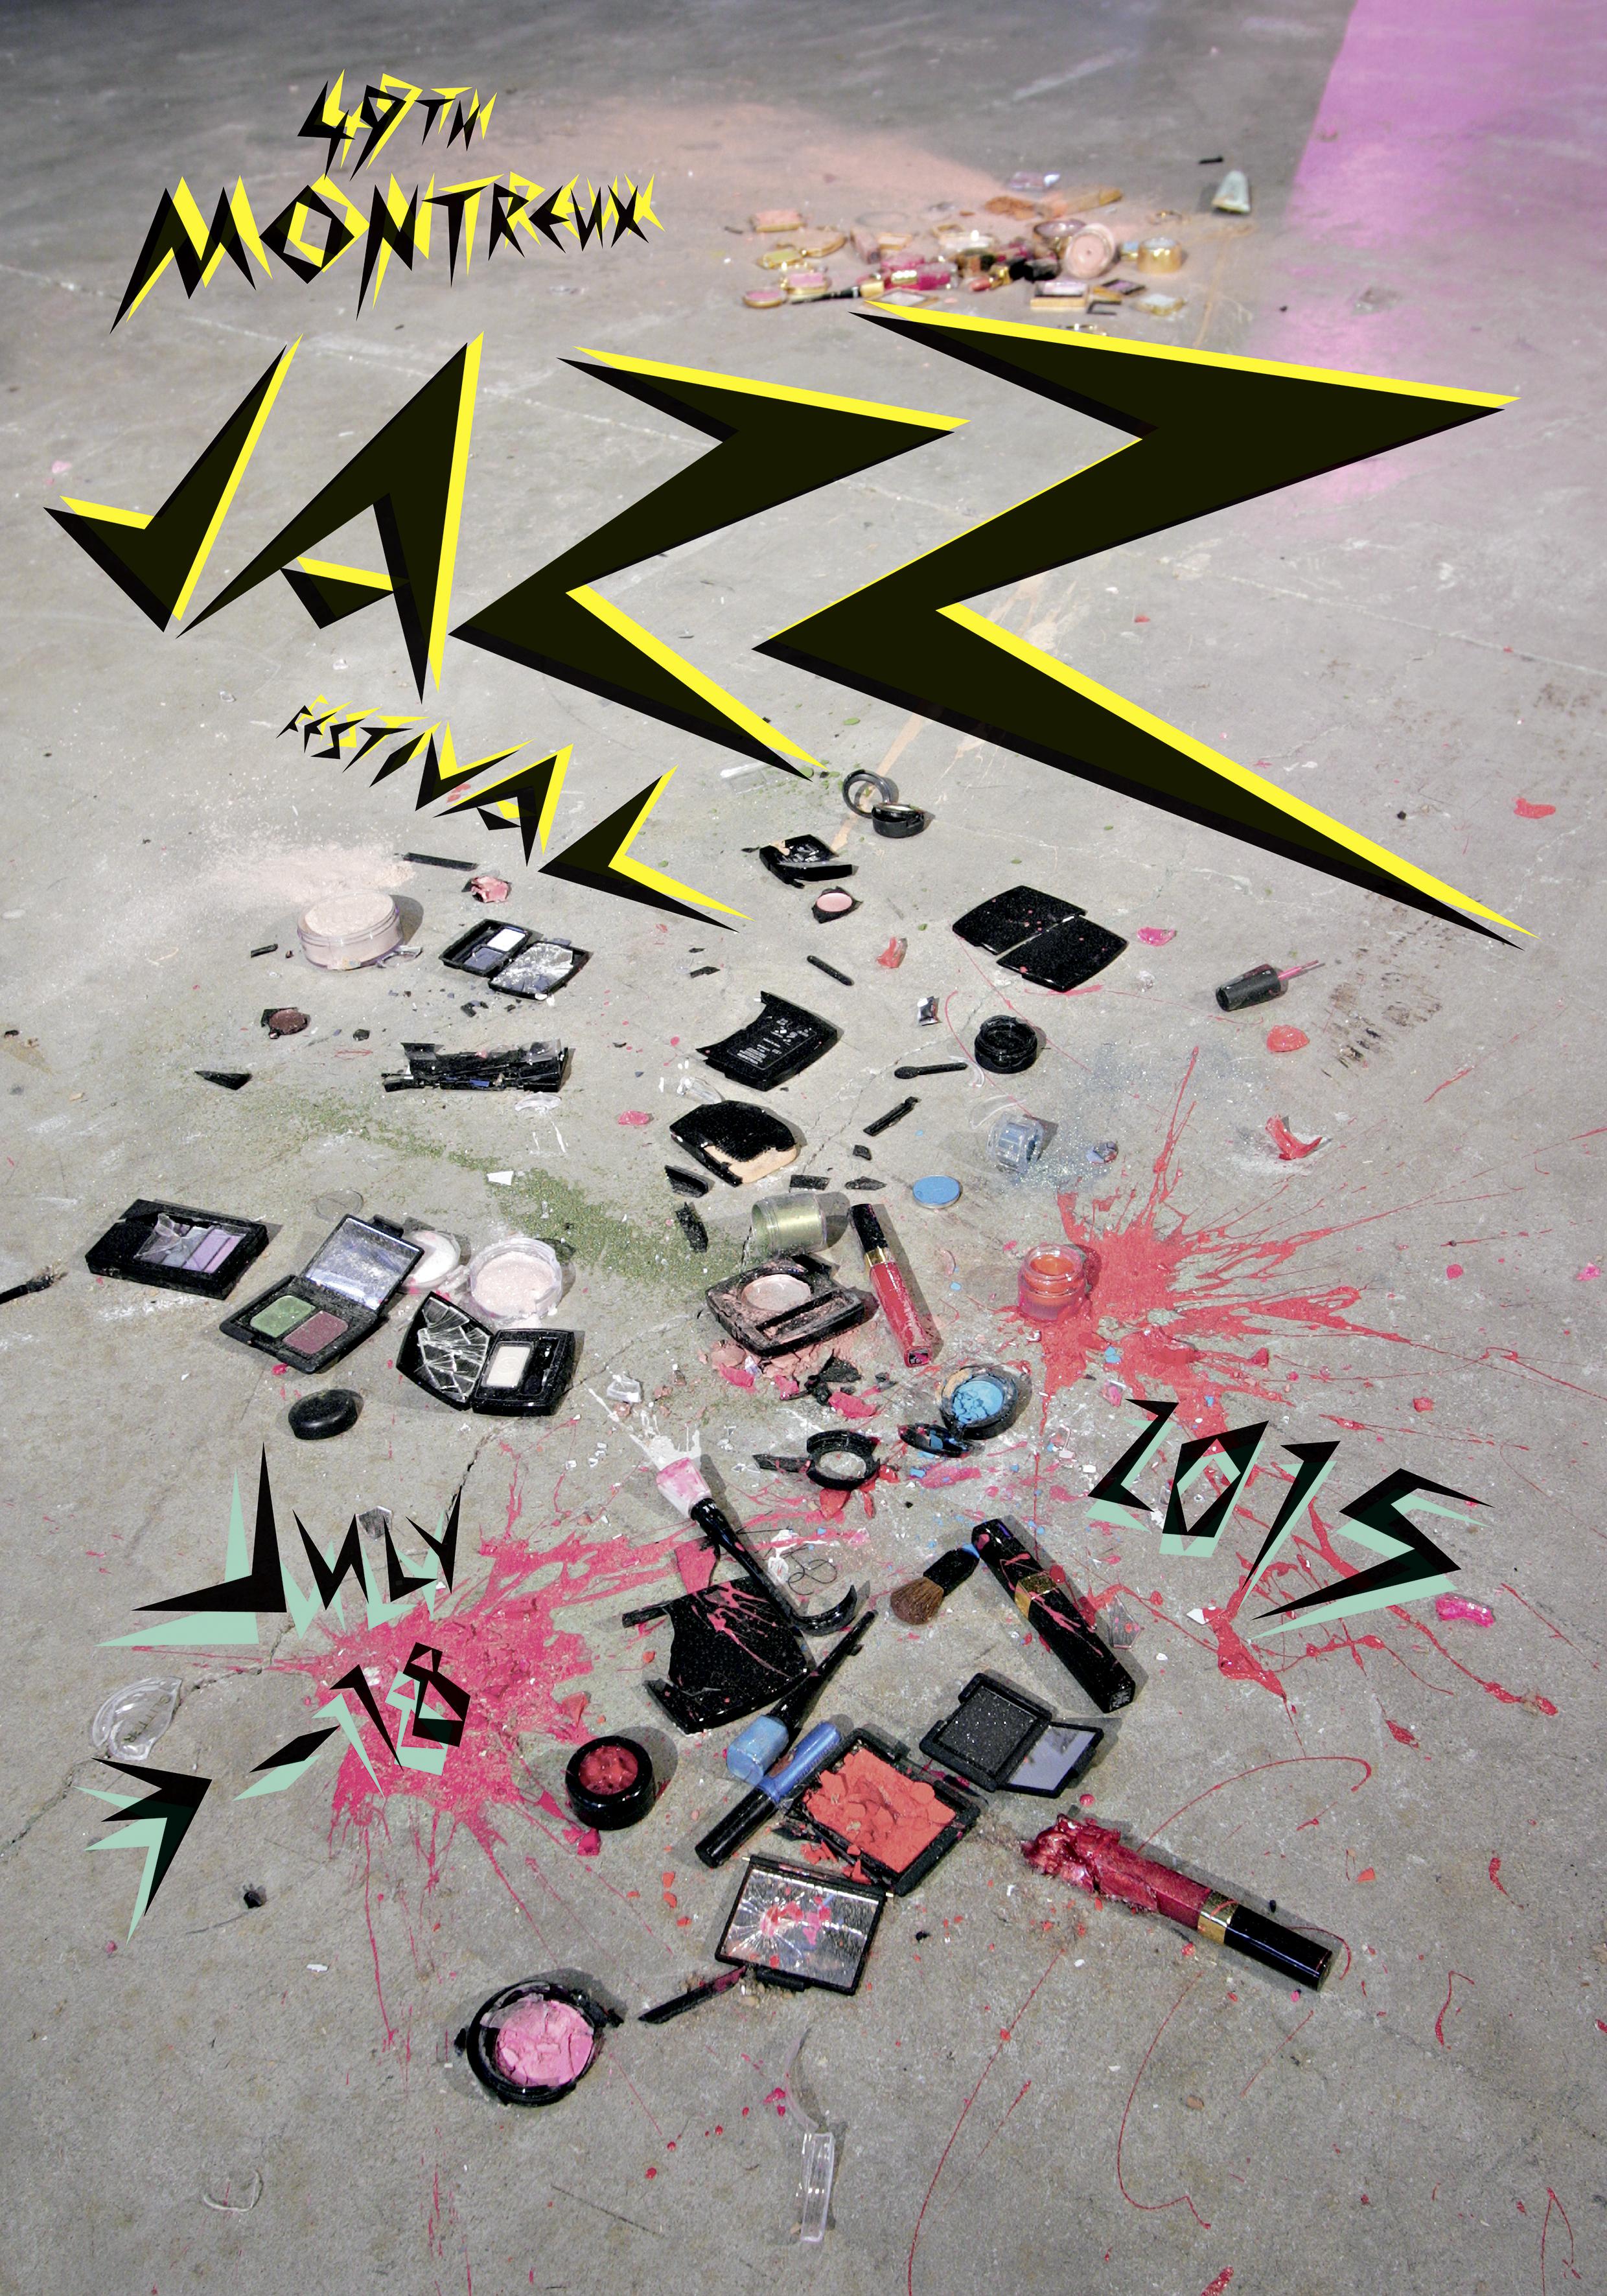 Montreux Jazz Festival 2015 >> An Explosion Of Color For The Montreux Jazz Festival Poster